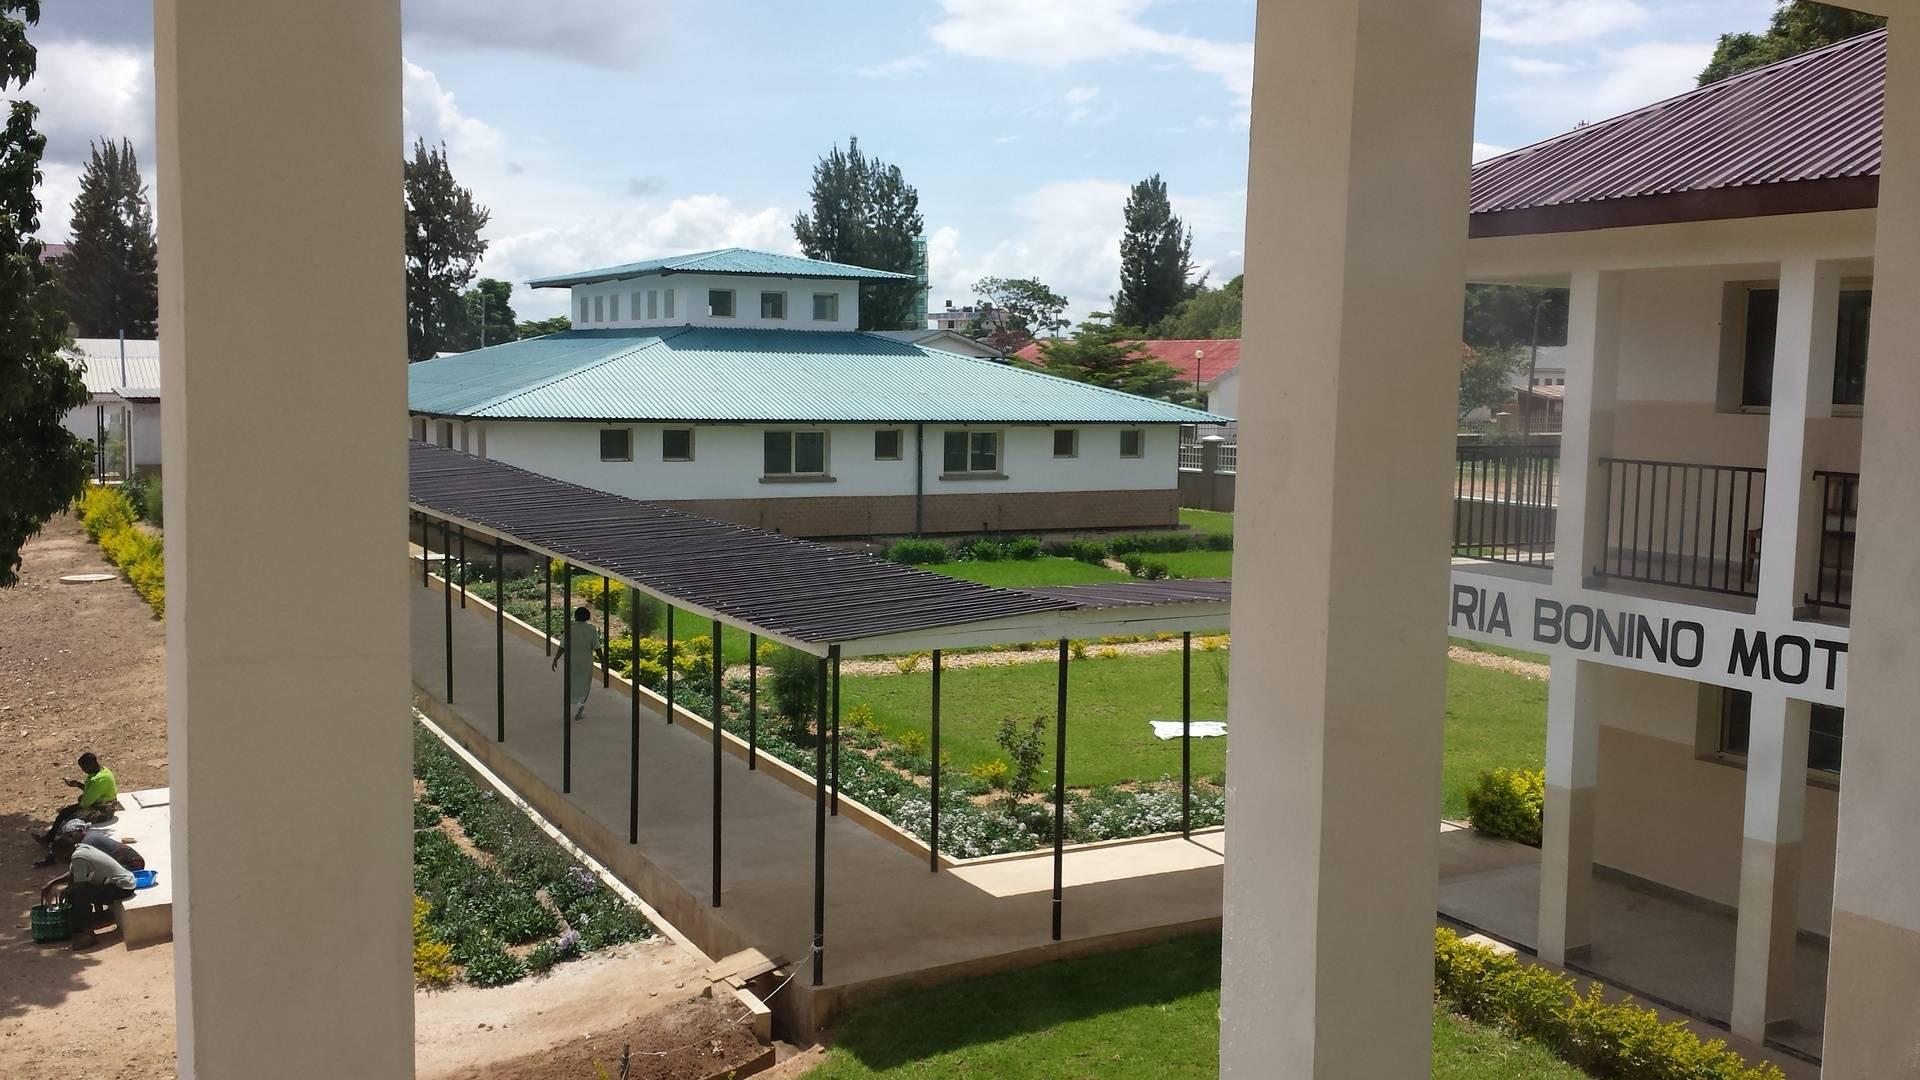 Mission Trip to Tanzania